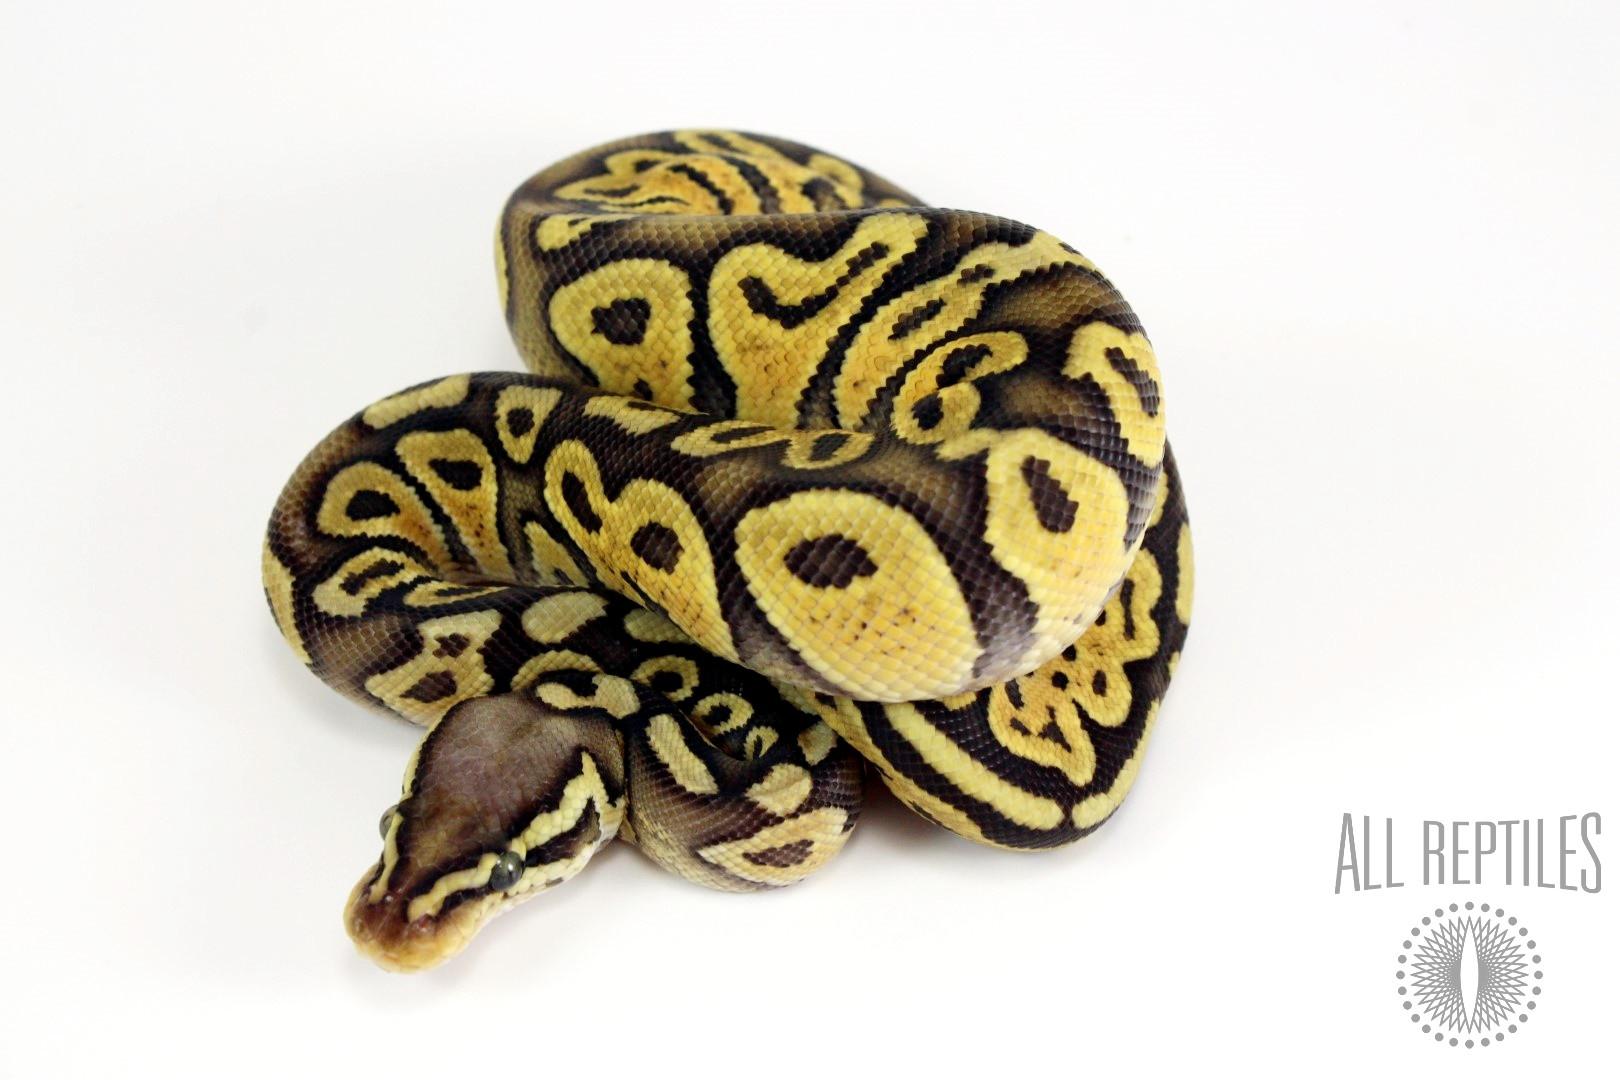 Super Pastel Chocolate Het Pied Ball Python